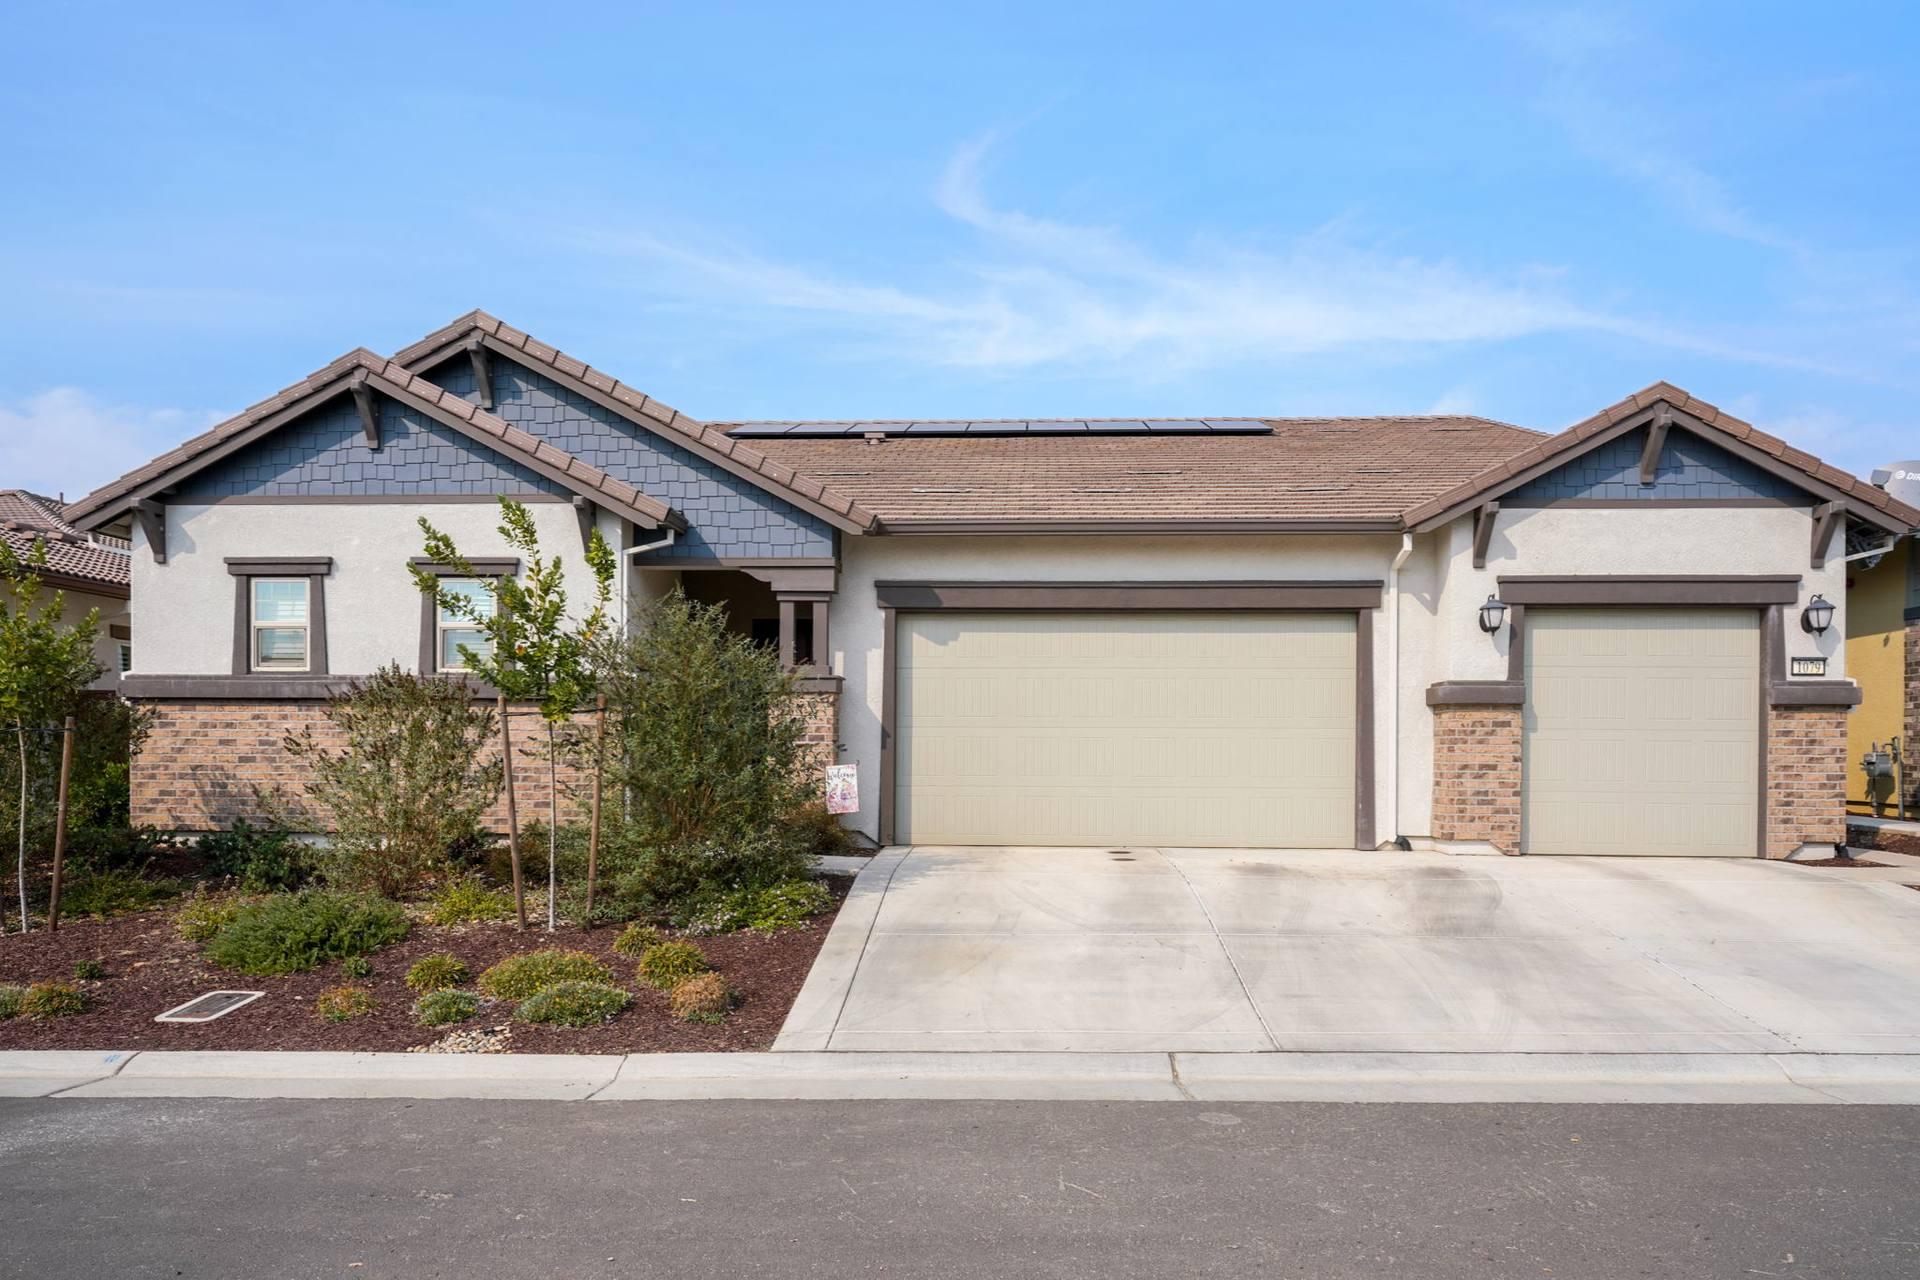 1079 Catalina Way, El Dorado Hills, CA 95762, USA